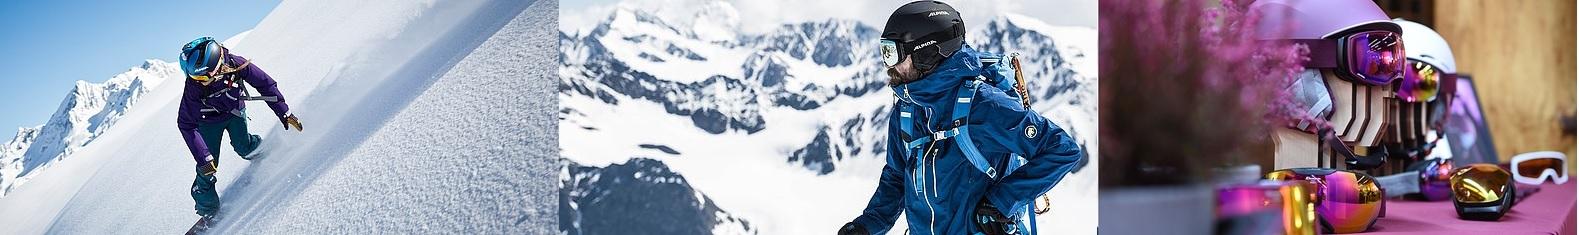 Skihelm-online-merken-alpina